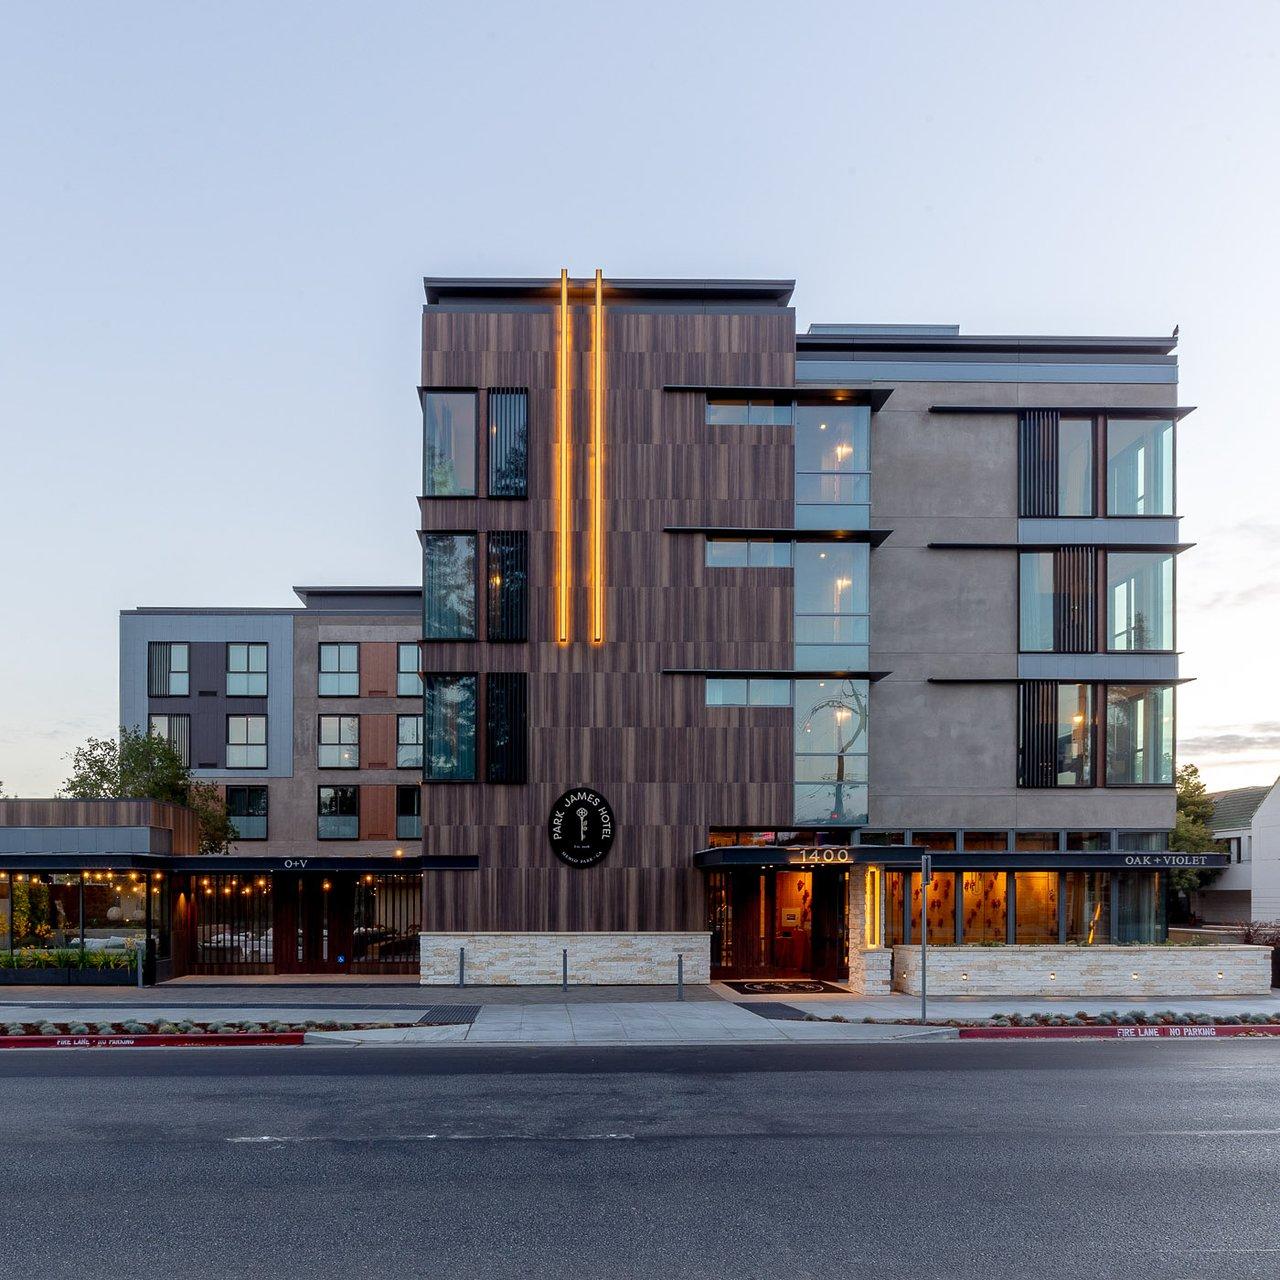 Park James Hotel 151 1 8 9 Updated 2018 Prices Reviews Menlo Ca Tripadvisor